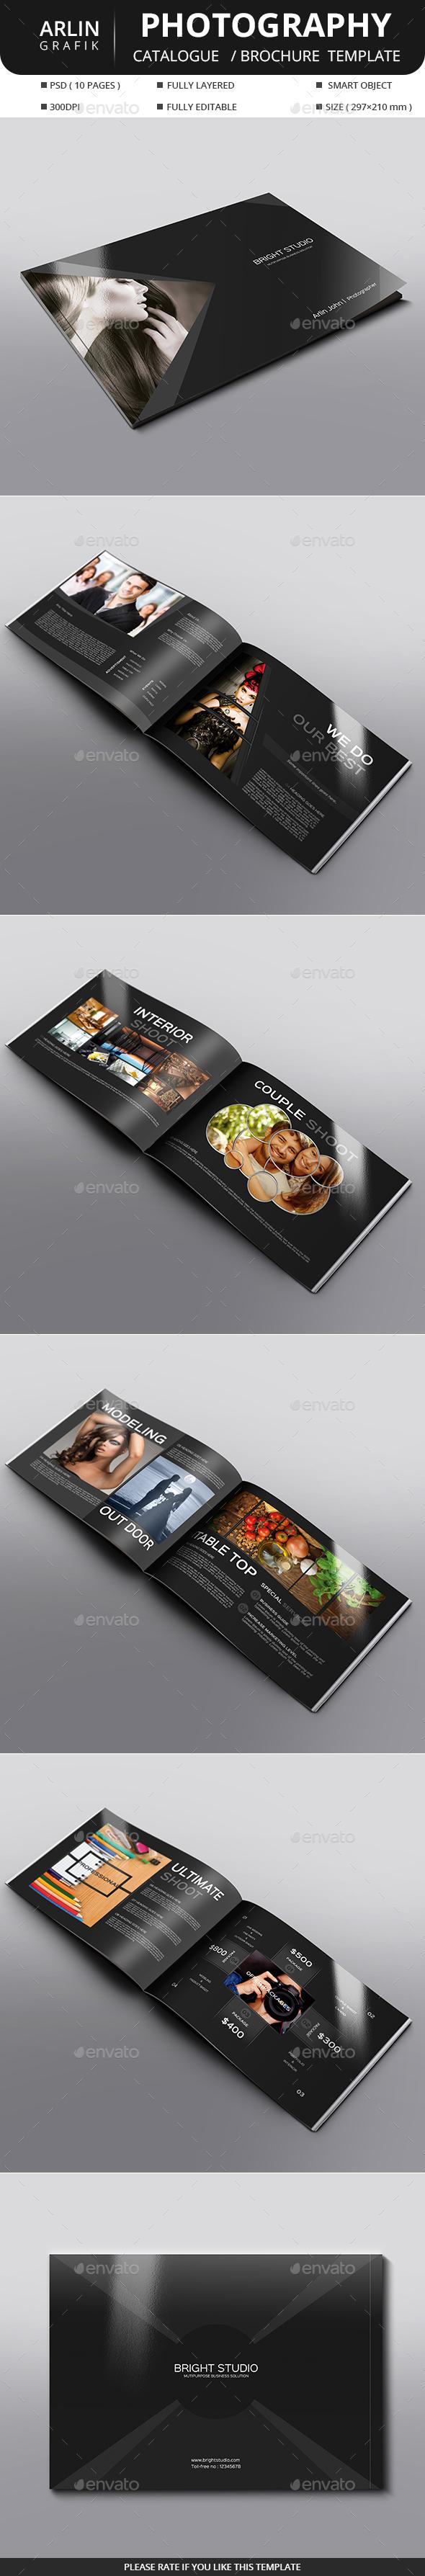 Photography Brochure - Portfolio Brochures